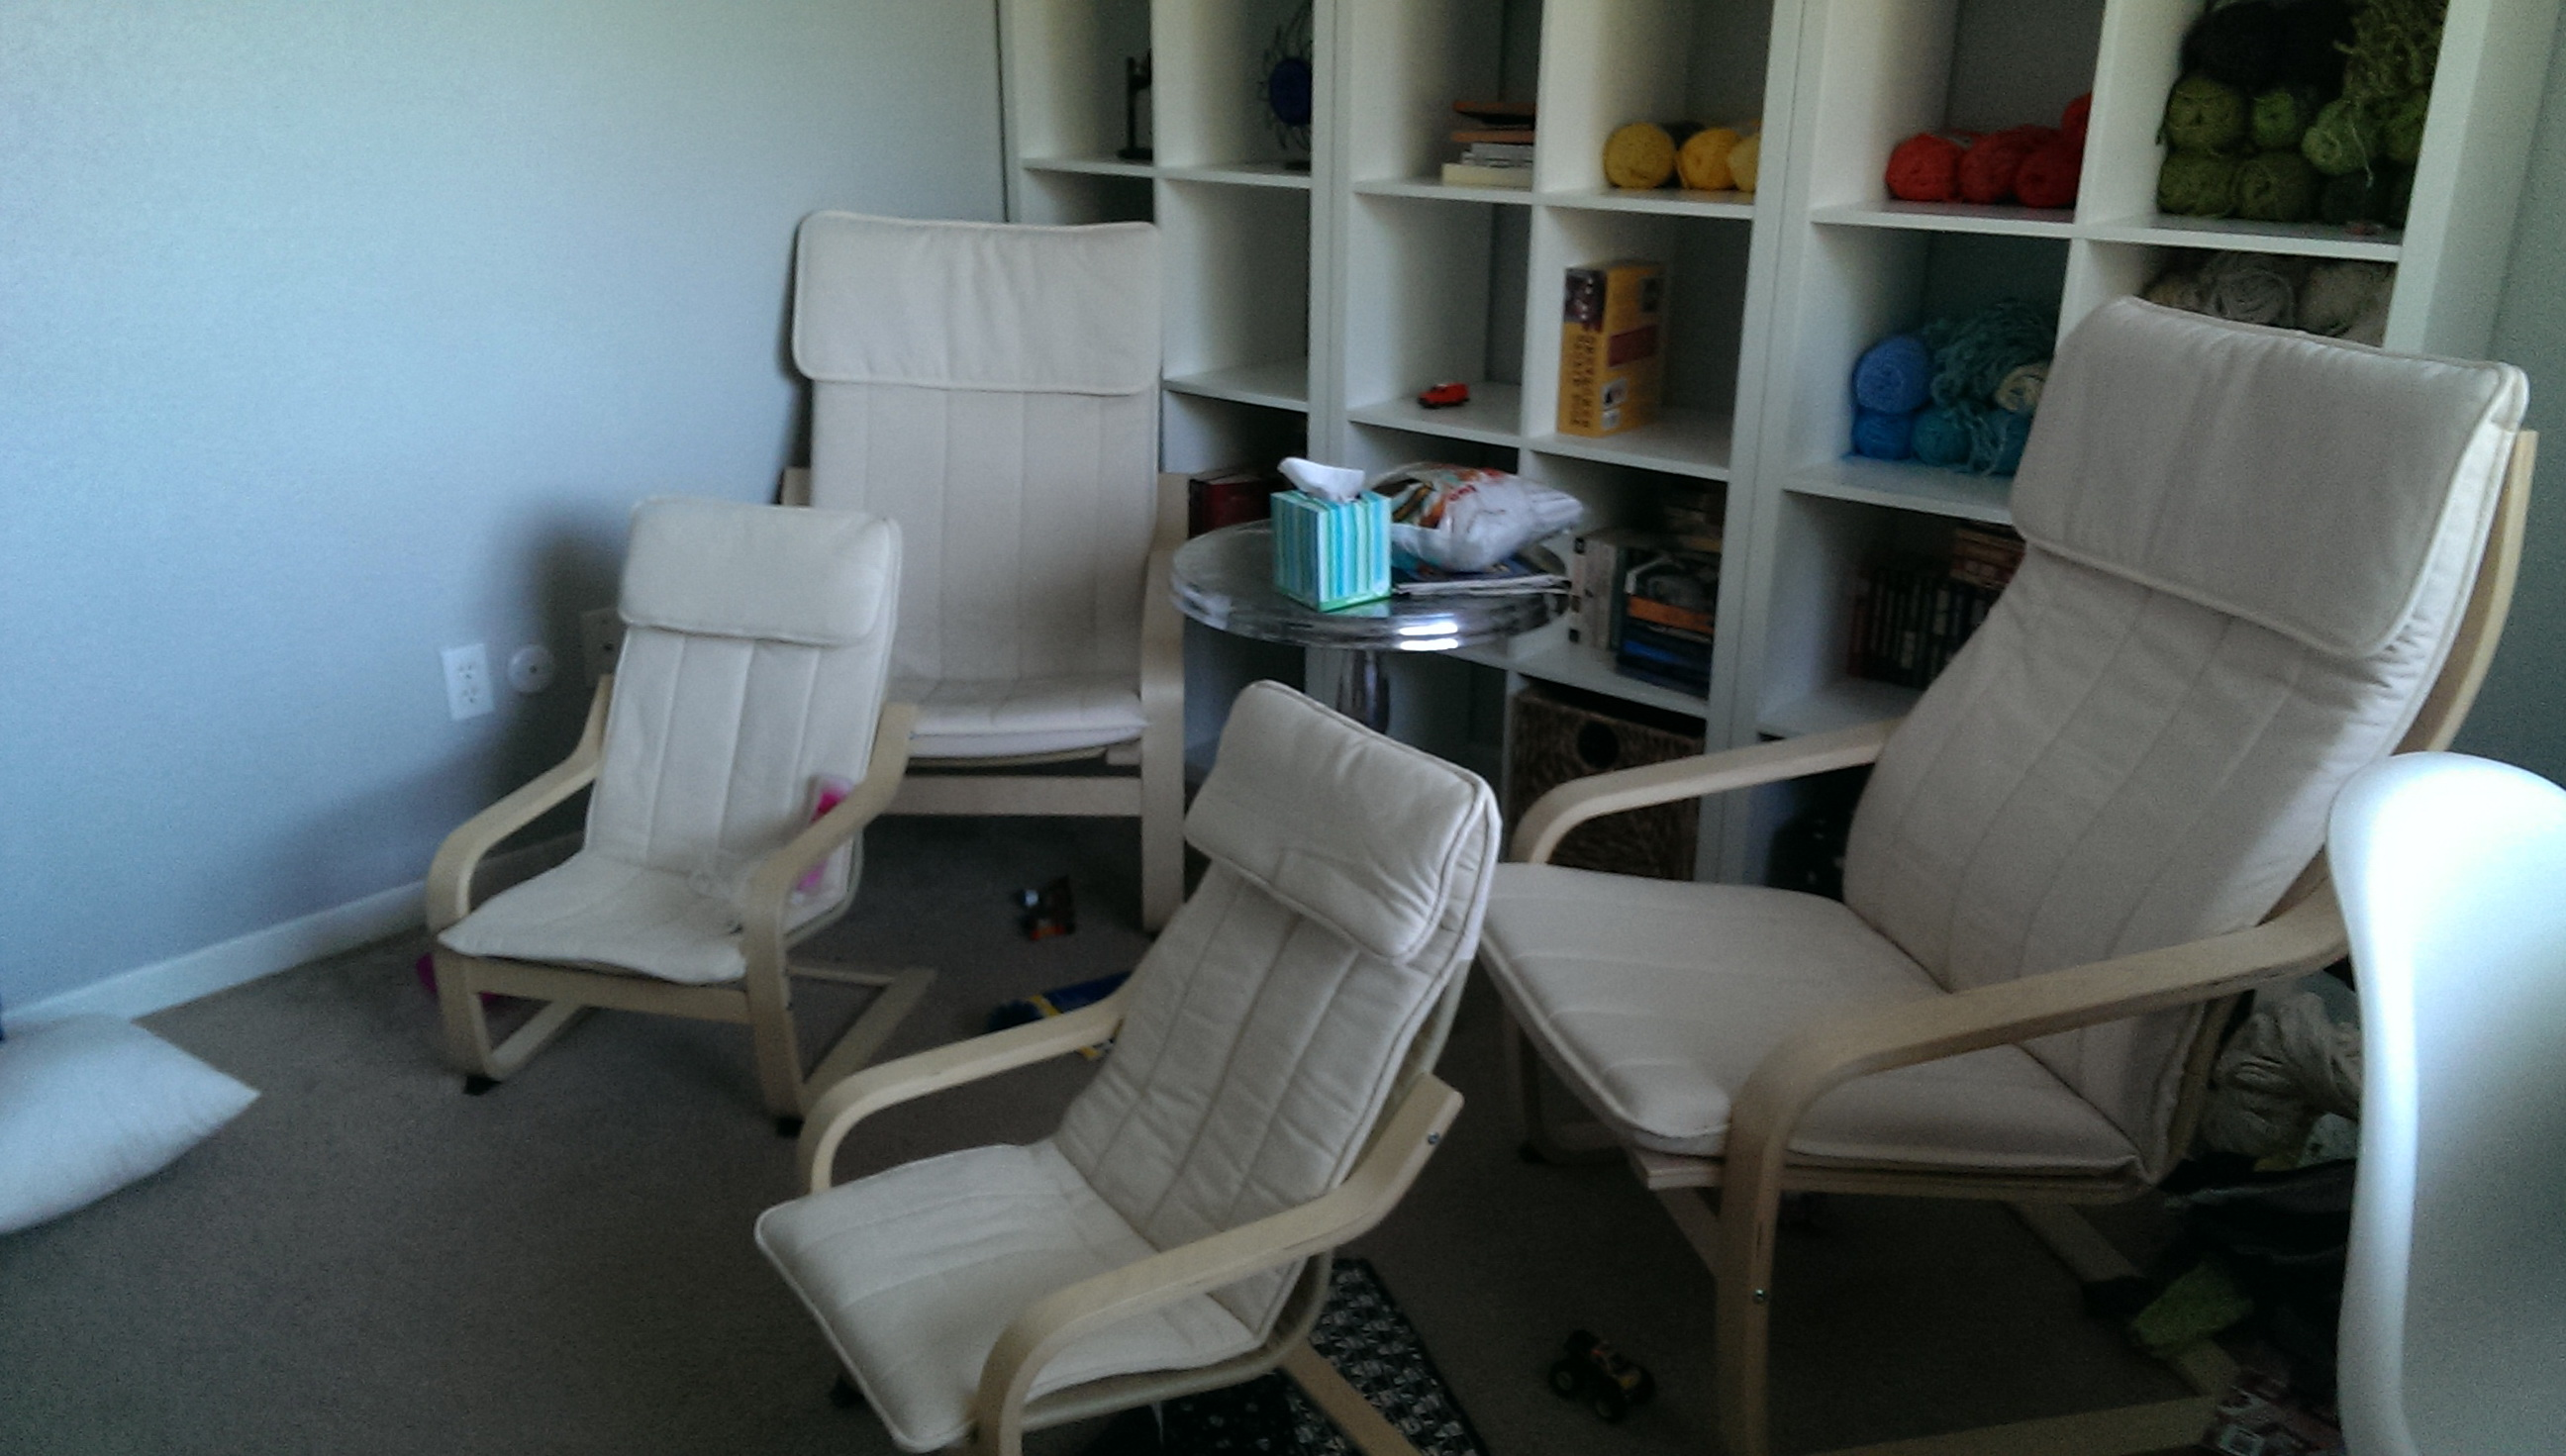 Ikea Chair Cushions Poang